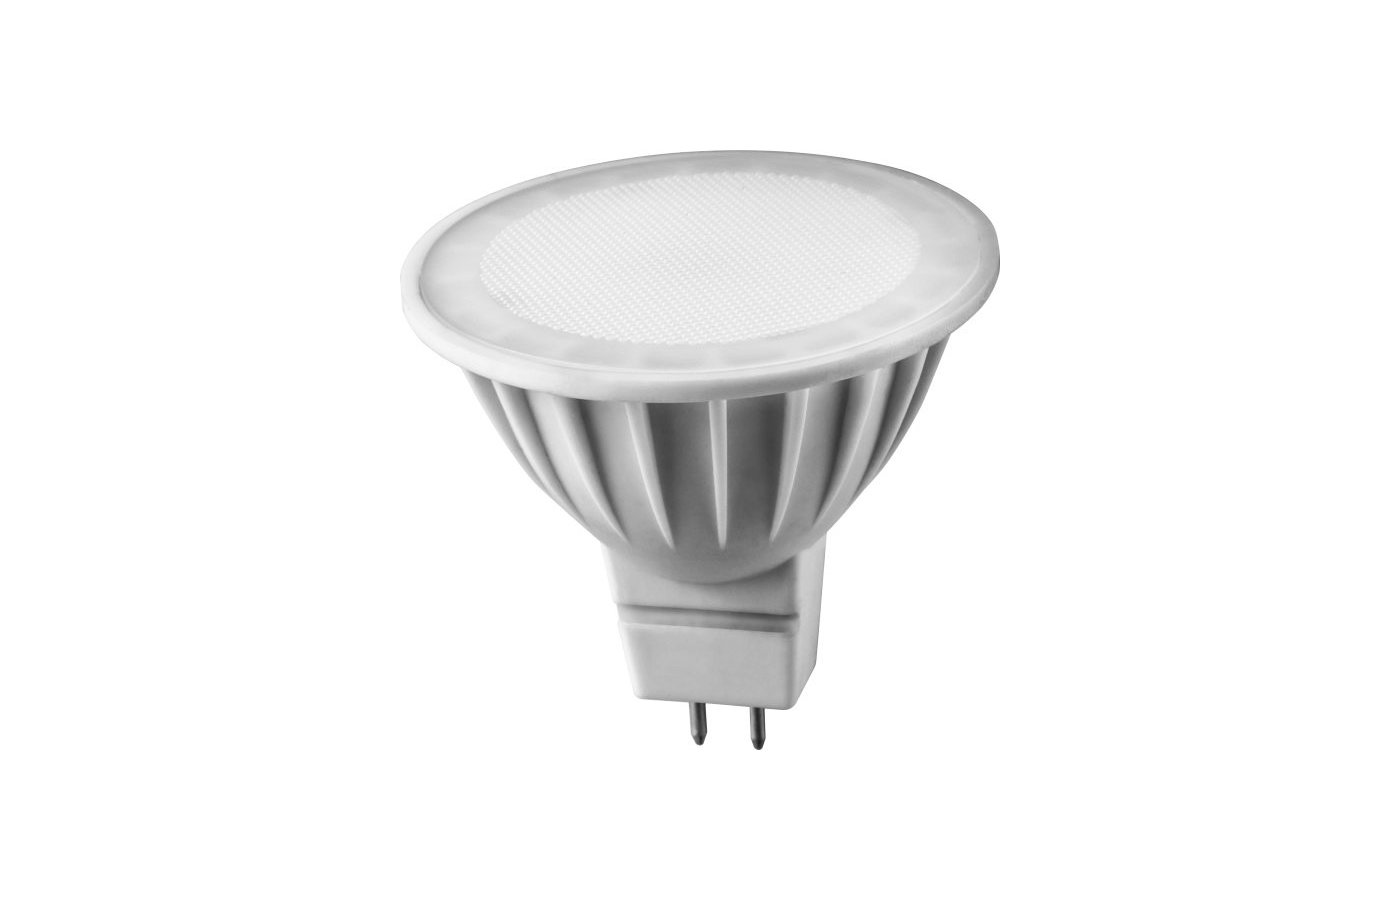 Лампочки LED ОНЛАЙТ LED 640 OLL-MR16-7-230-3K-GU5.3